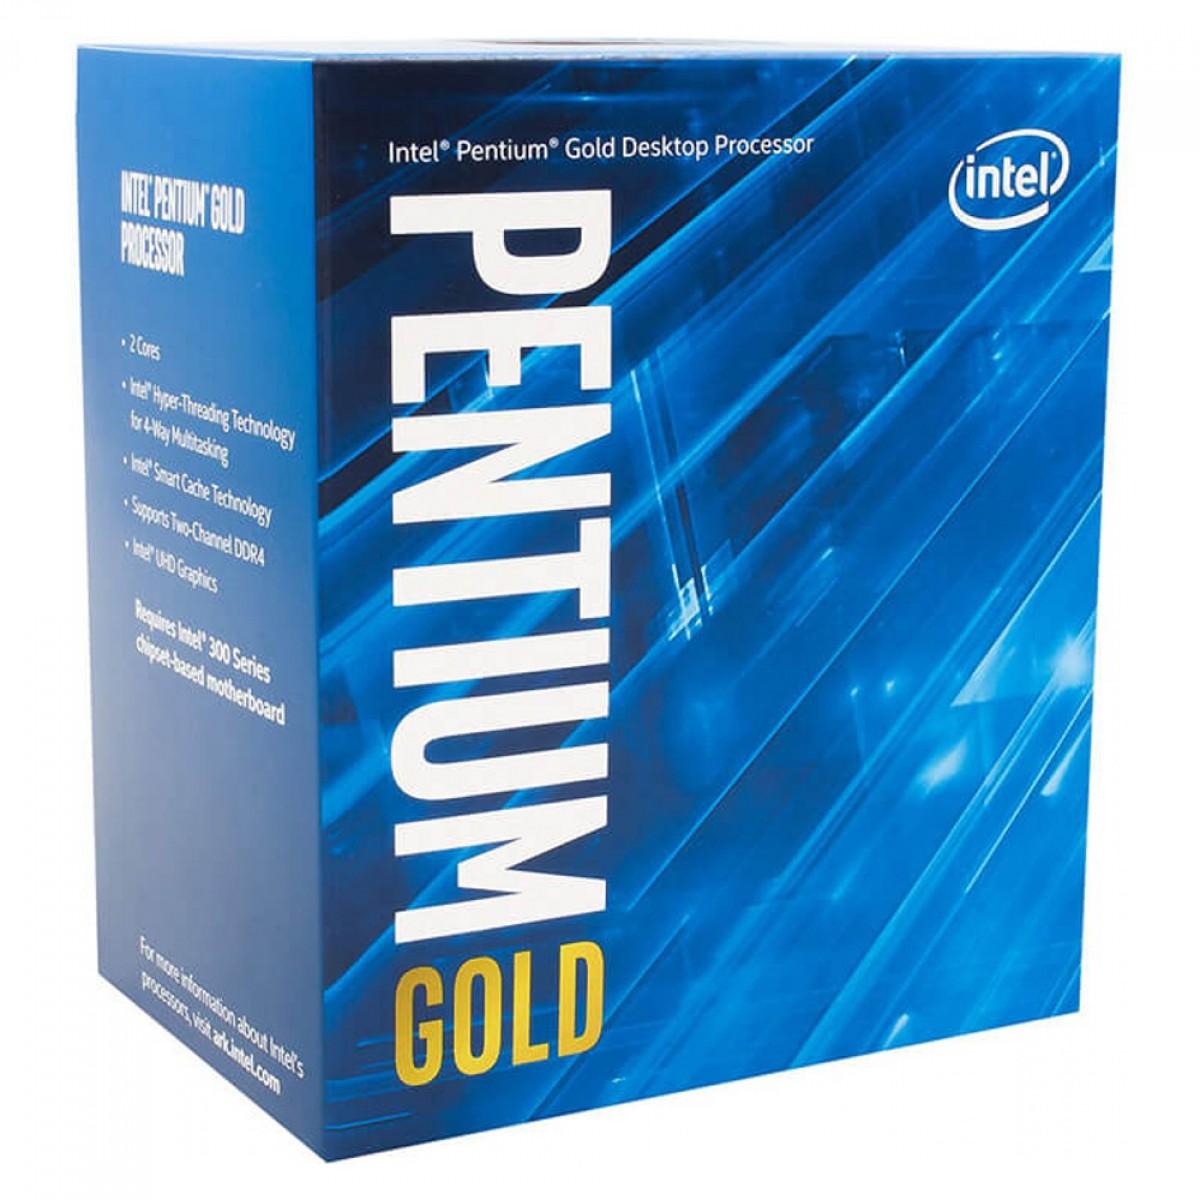 Kit Upgrade, Asus Prime H310M-E + Intel Pentium Gold G5420 + 8GB DDR4 3000MHz